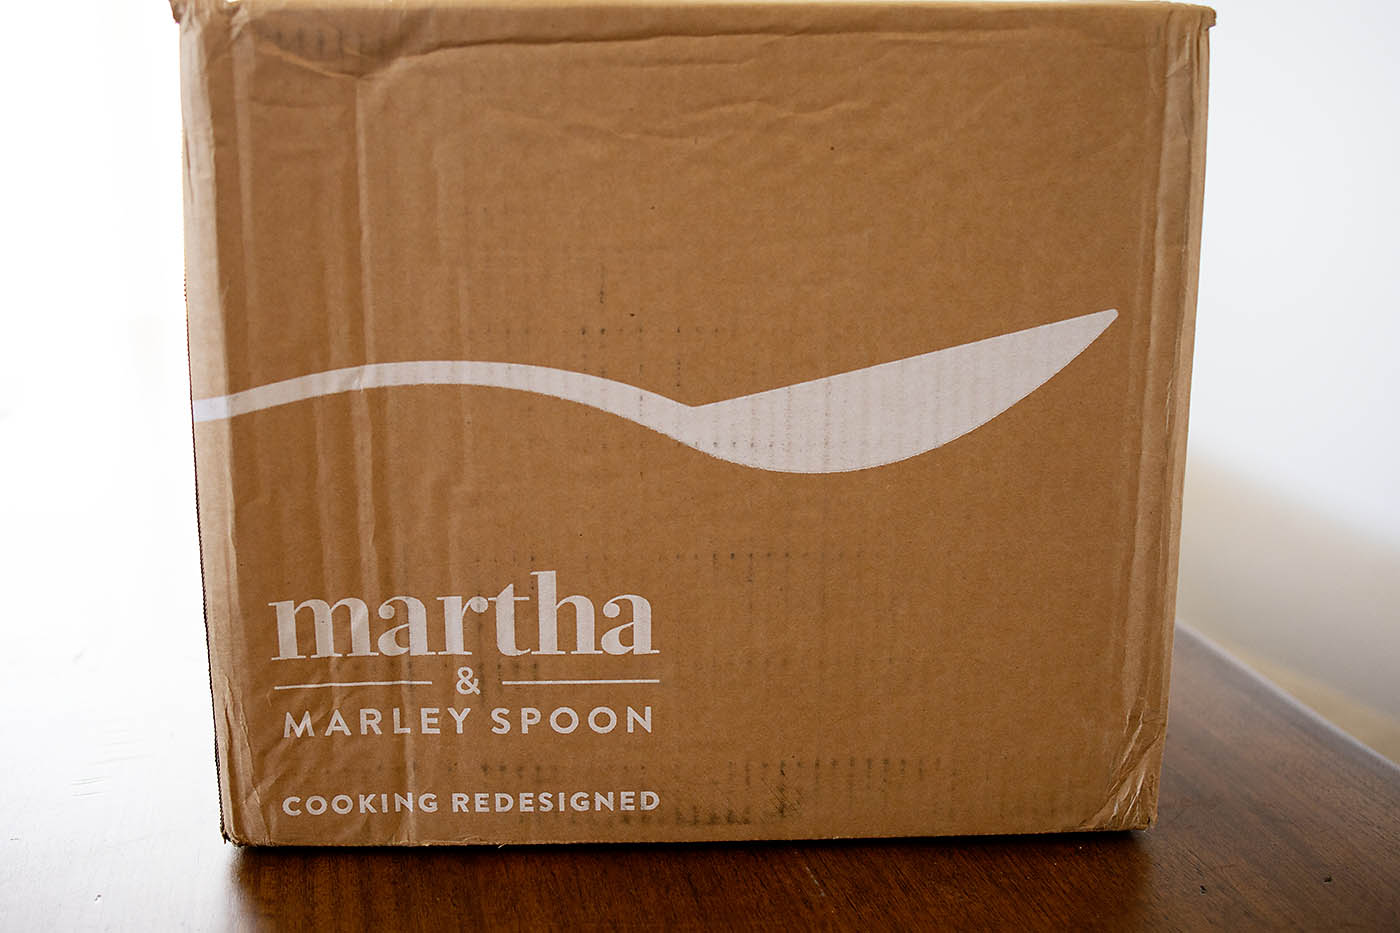 Martha & Marley Spoon review